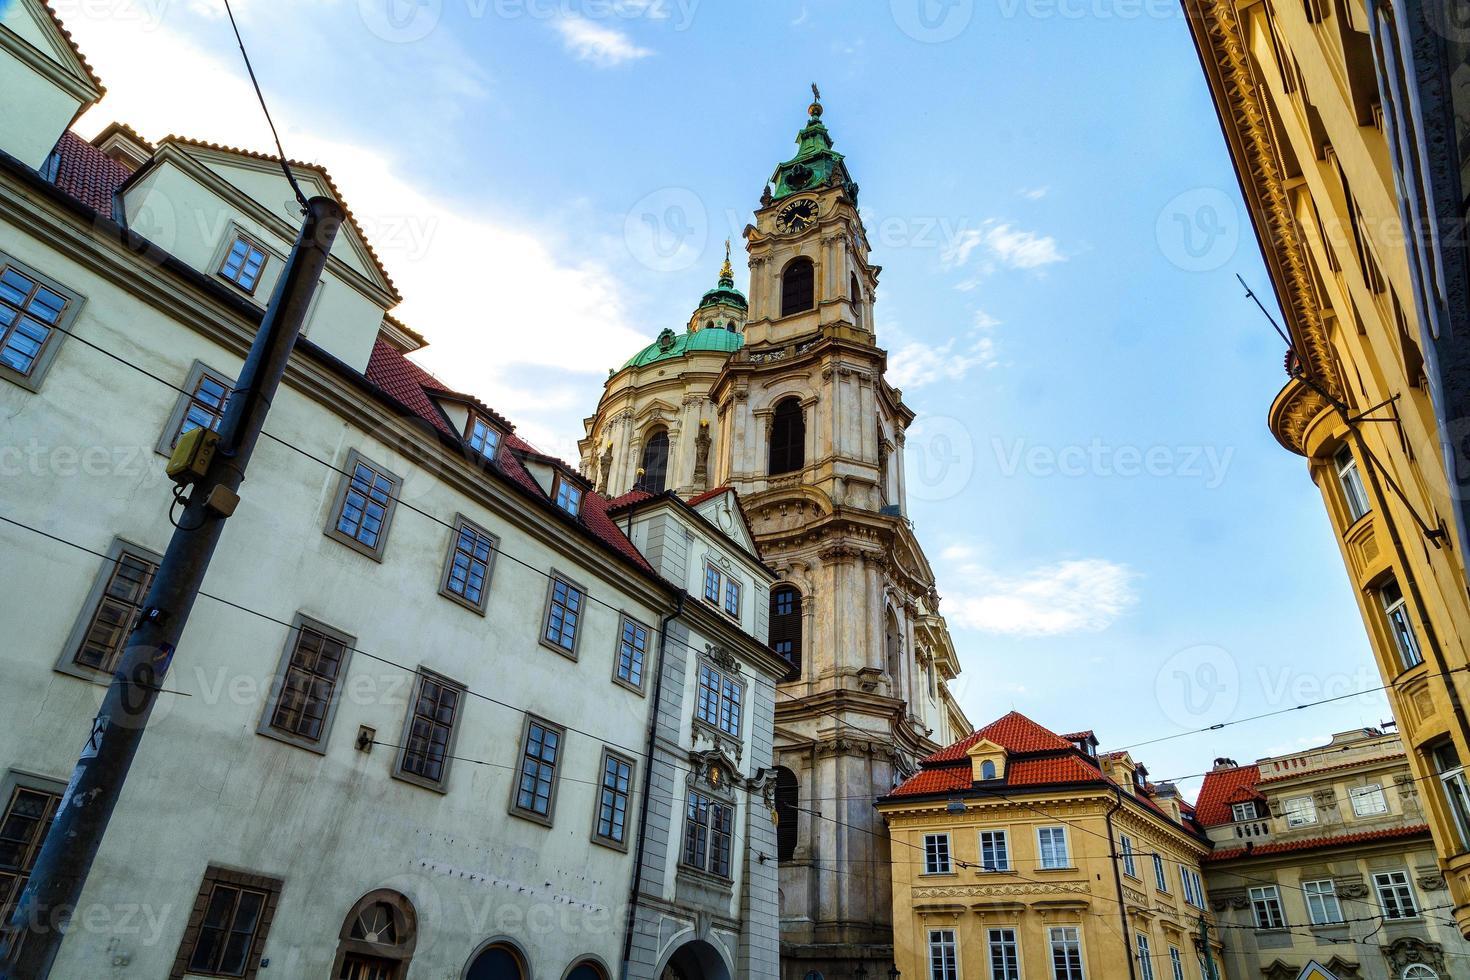 St.Nicholas Church in Mala Strana photo